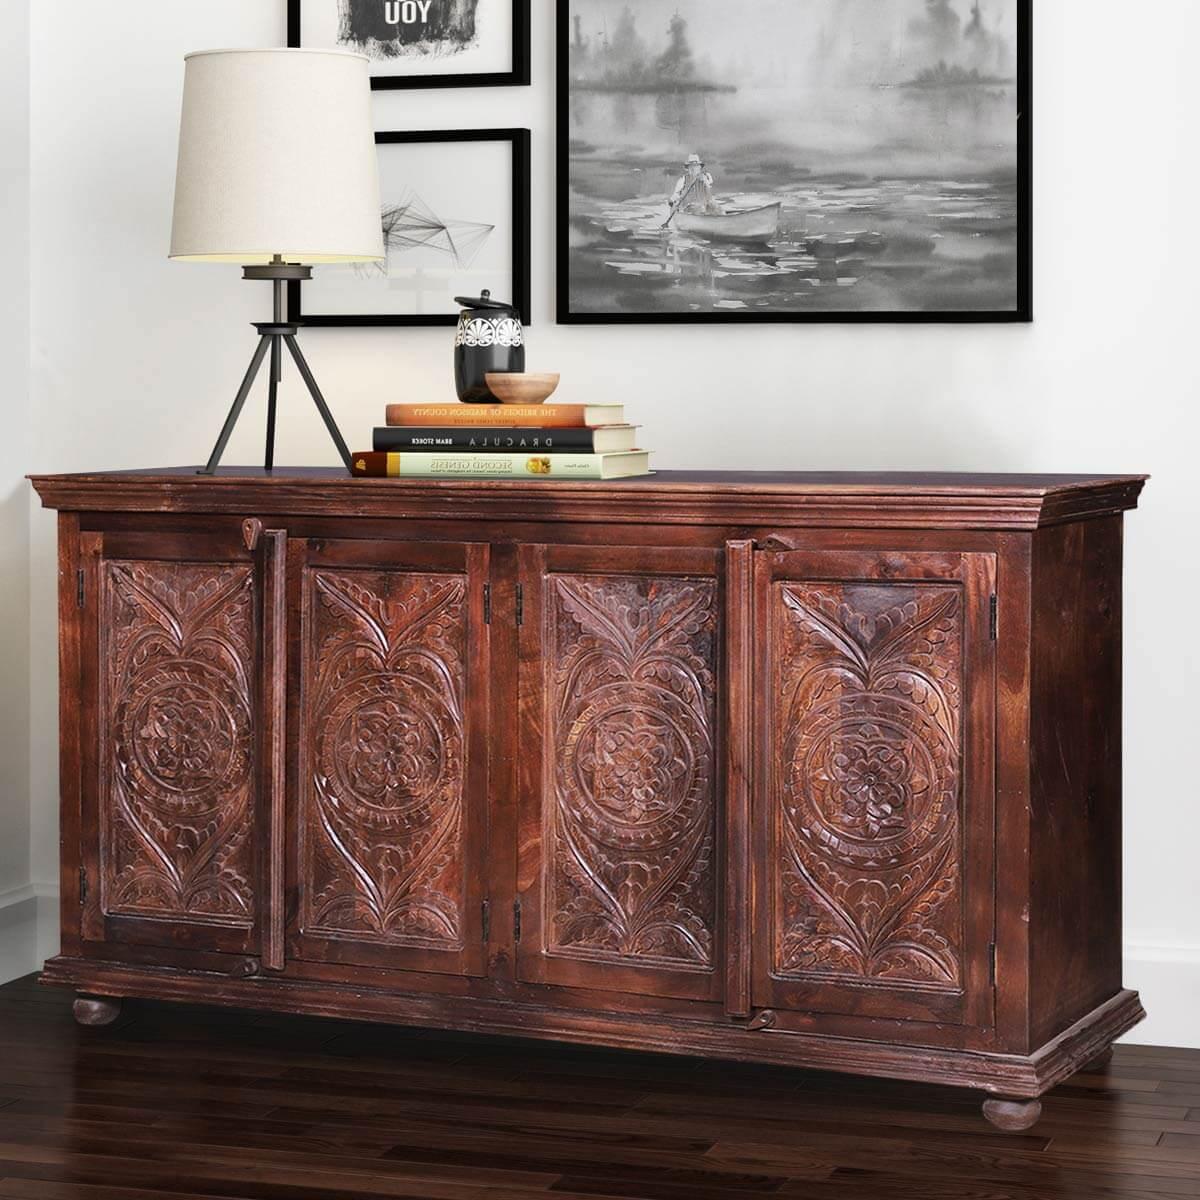 Bentonia Rustic Reclaimed Wood Furniture Large Buffet Cabinet